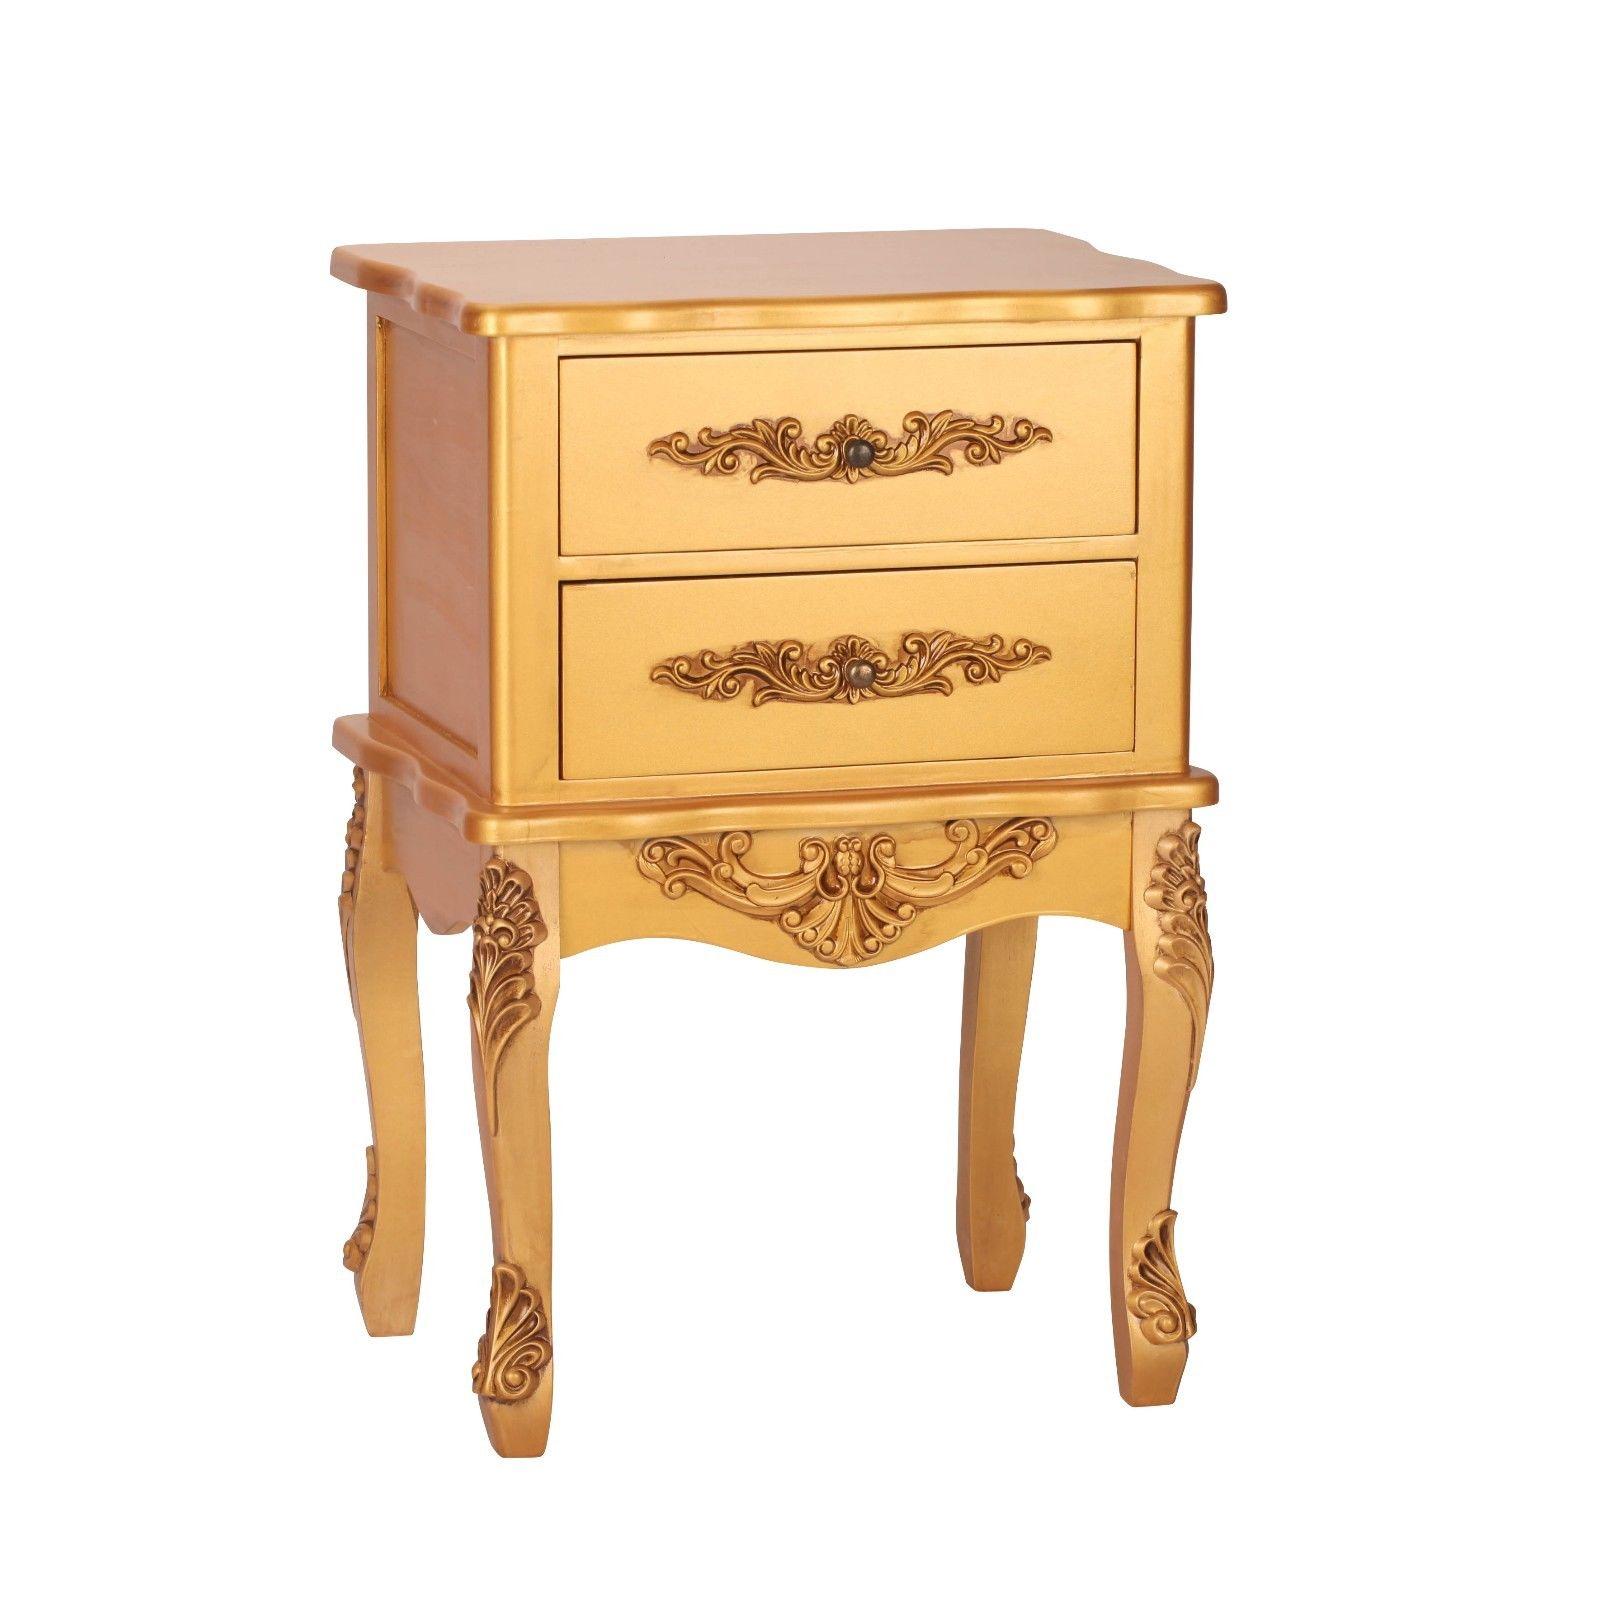 French Antique Gold 2 Drawer Bedside